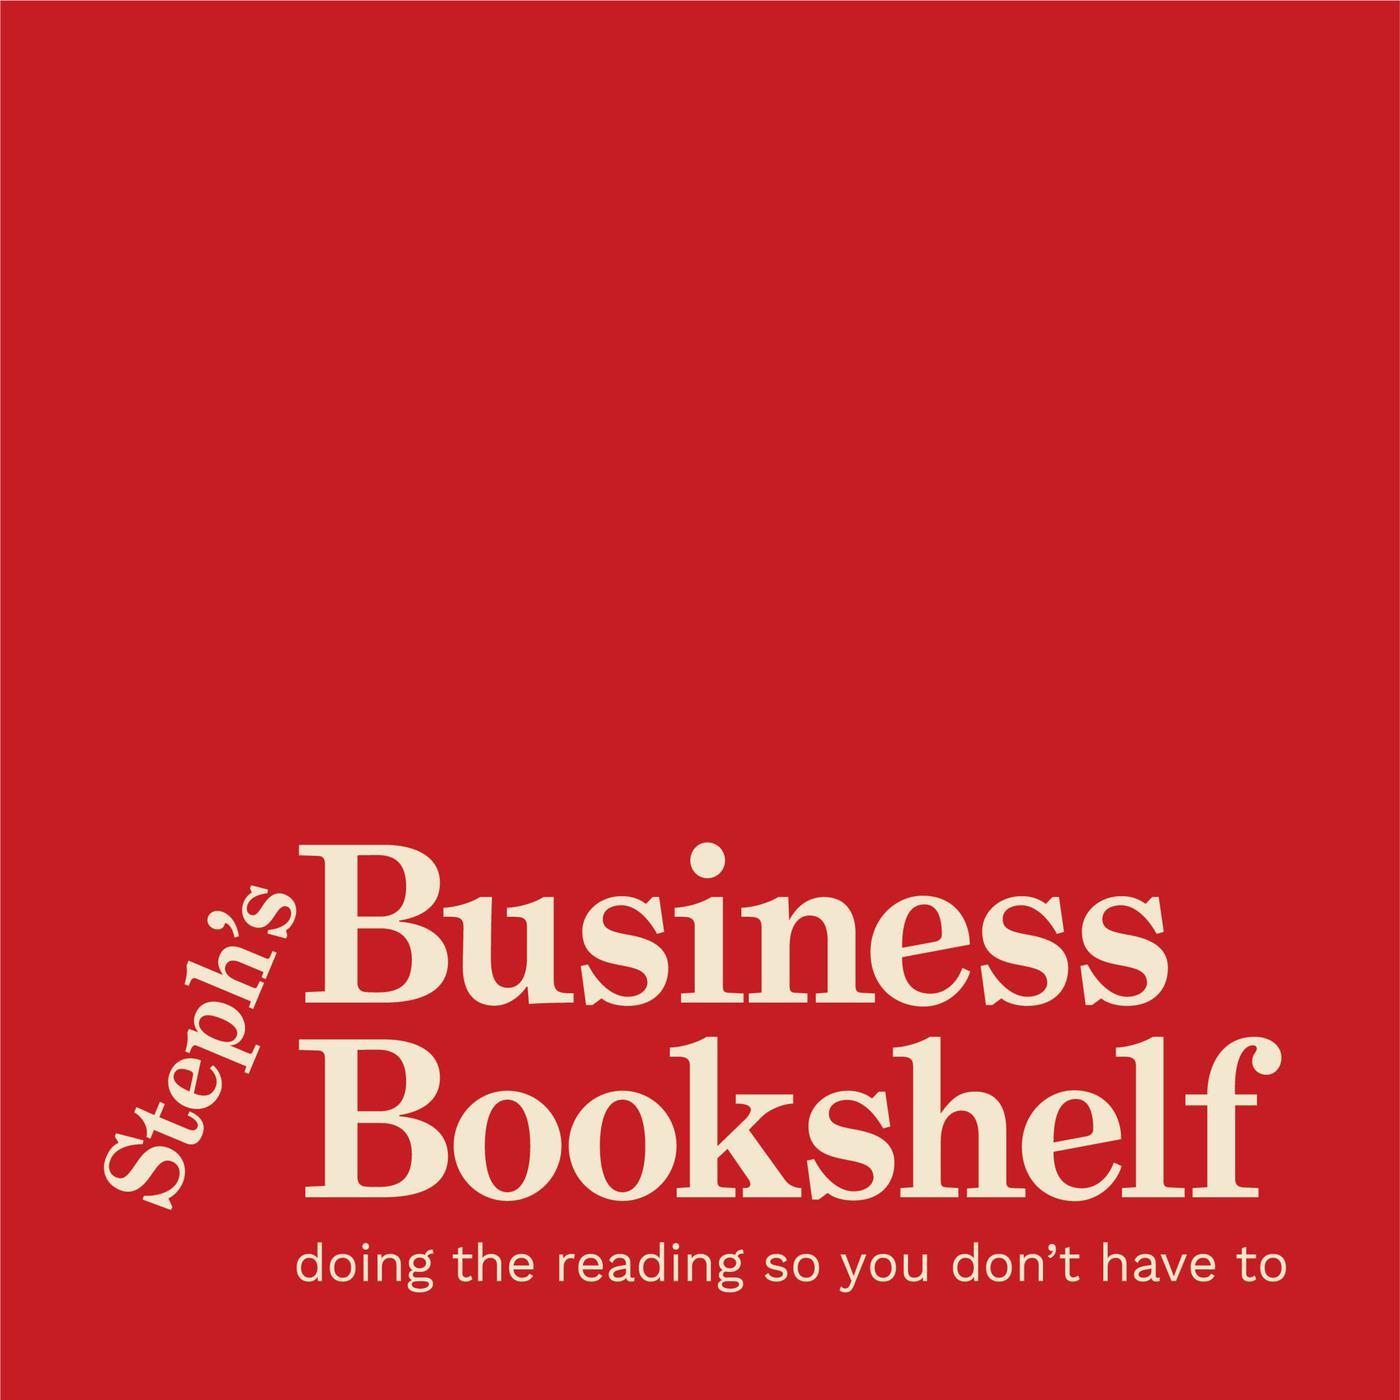 Steph's Business Bookshelf